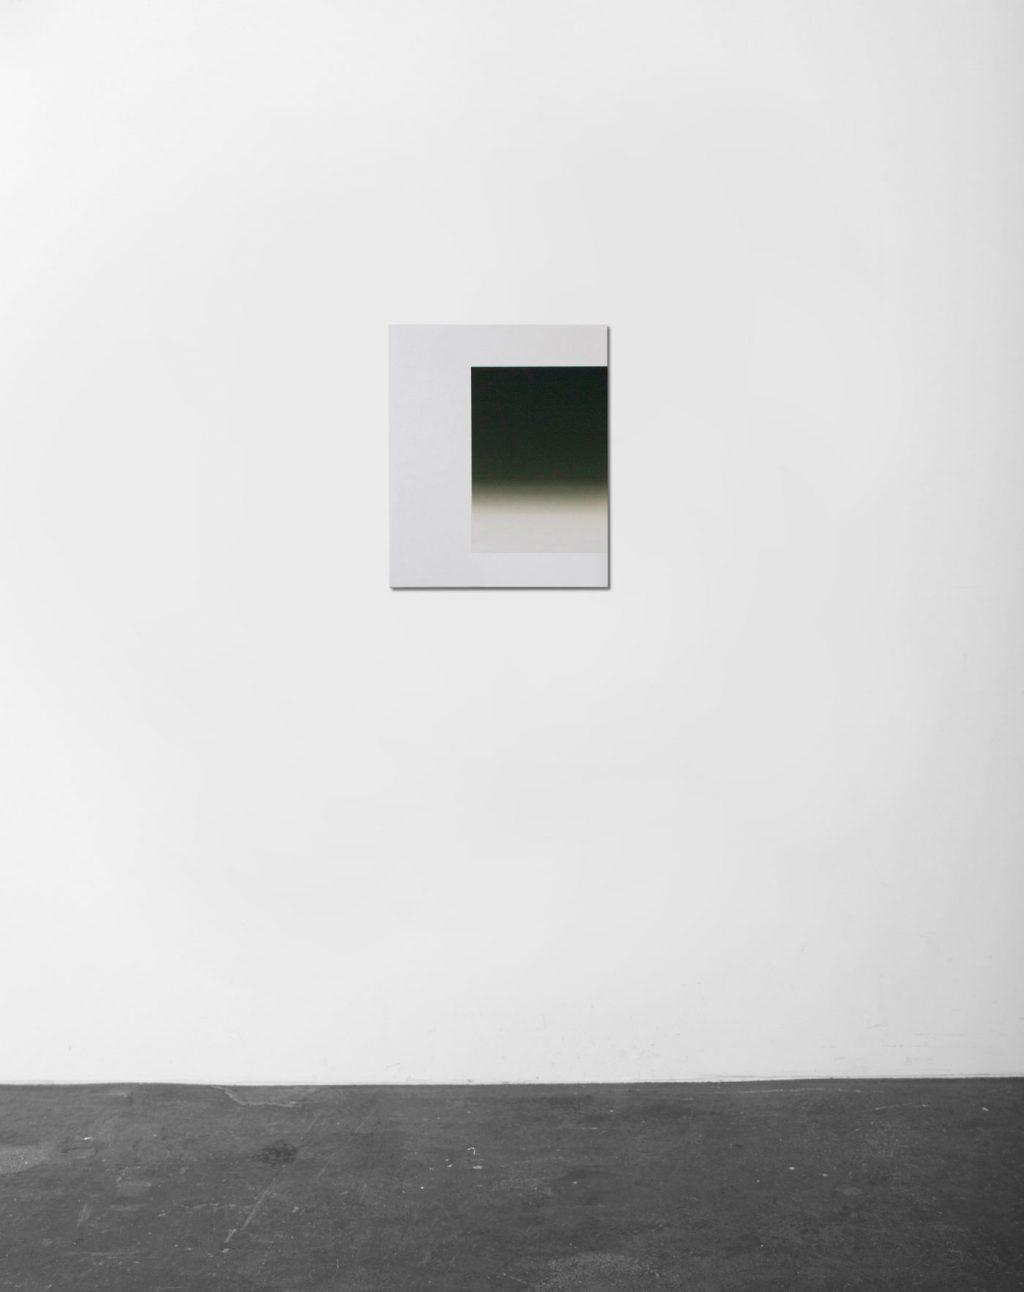 Untitled #25 – 2017